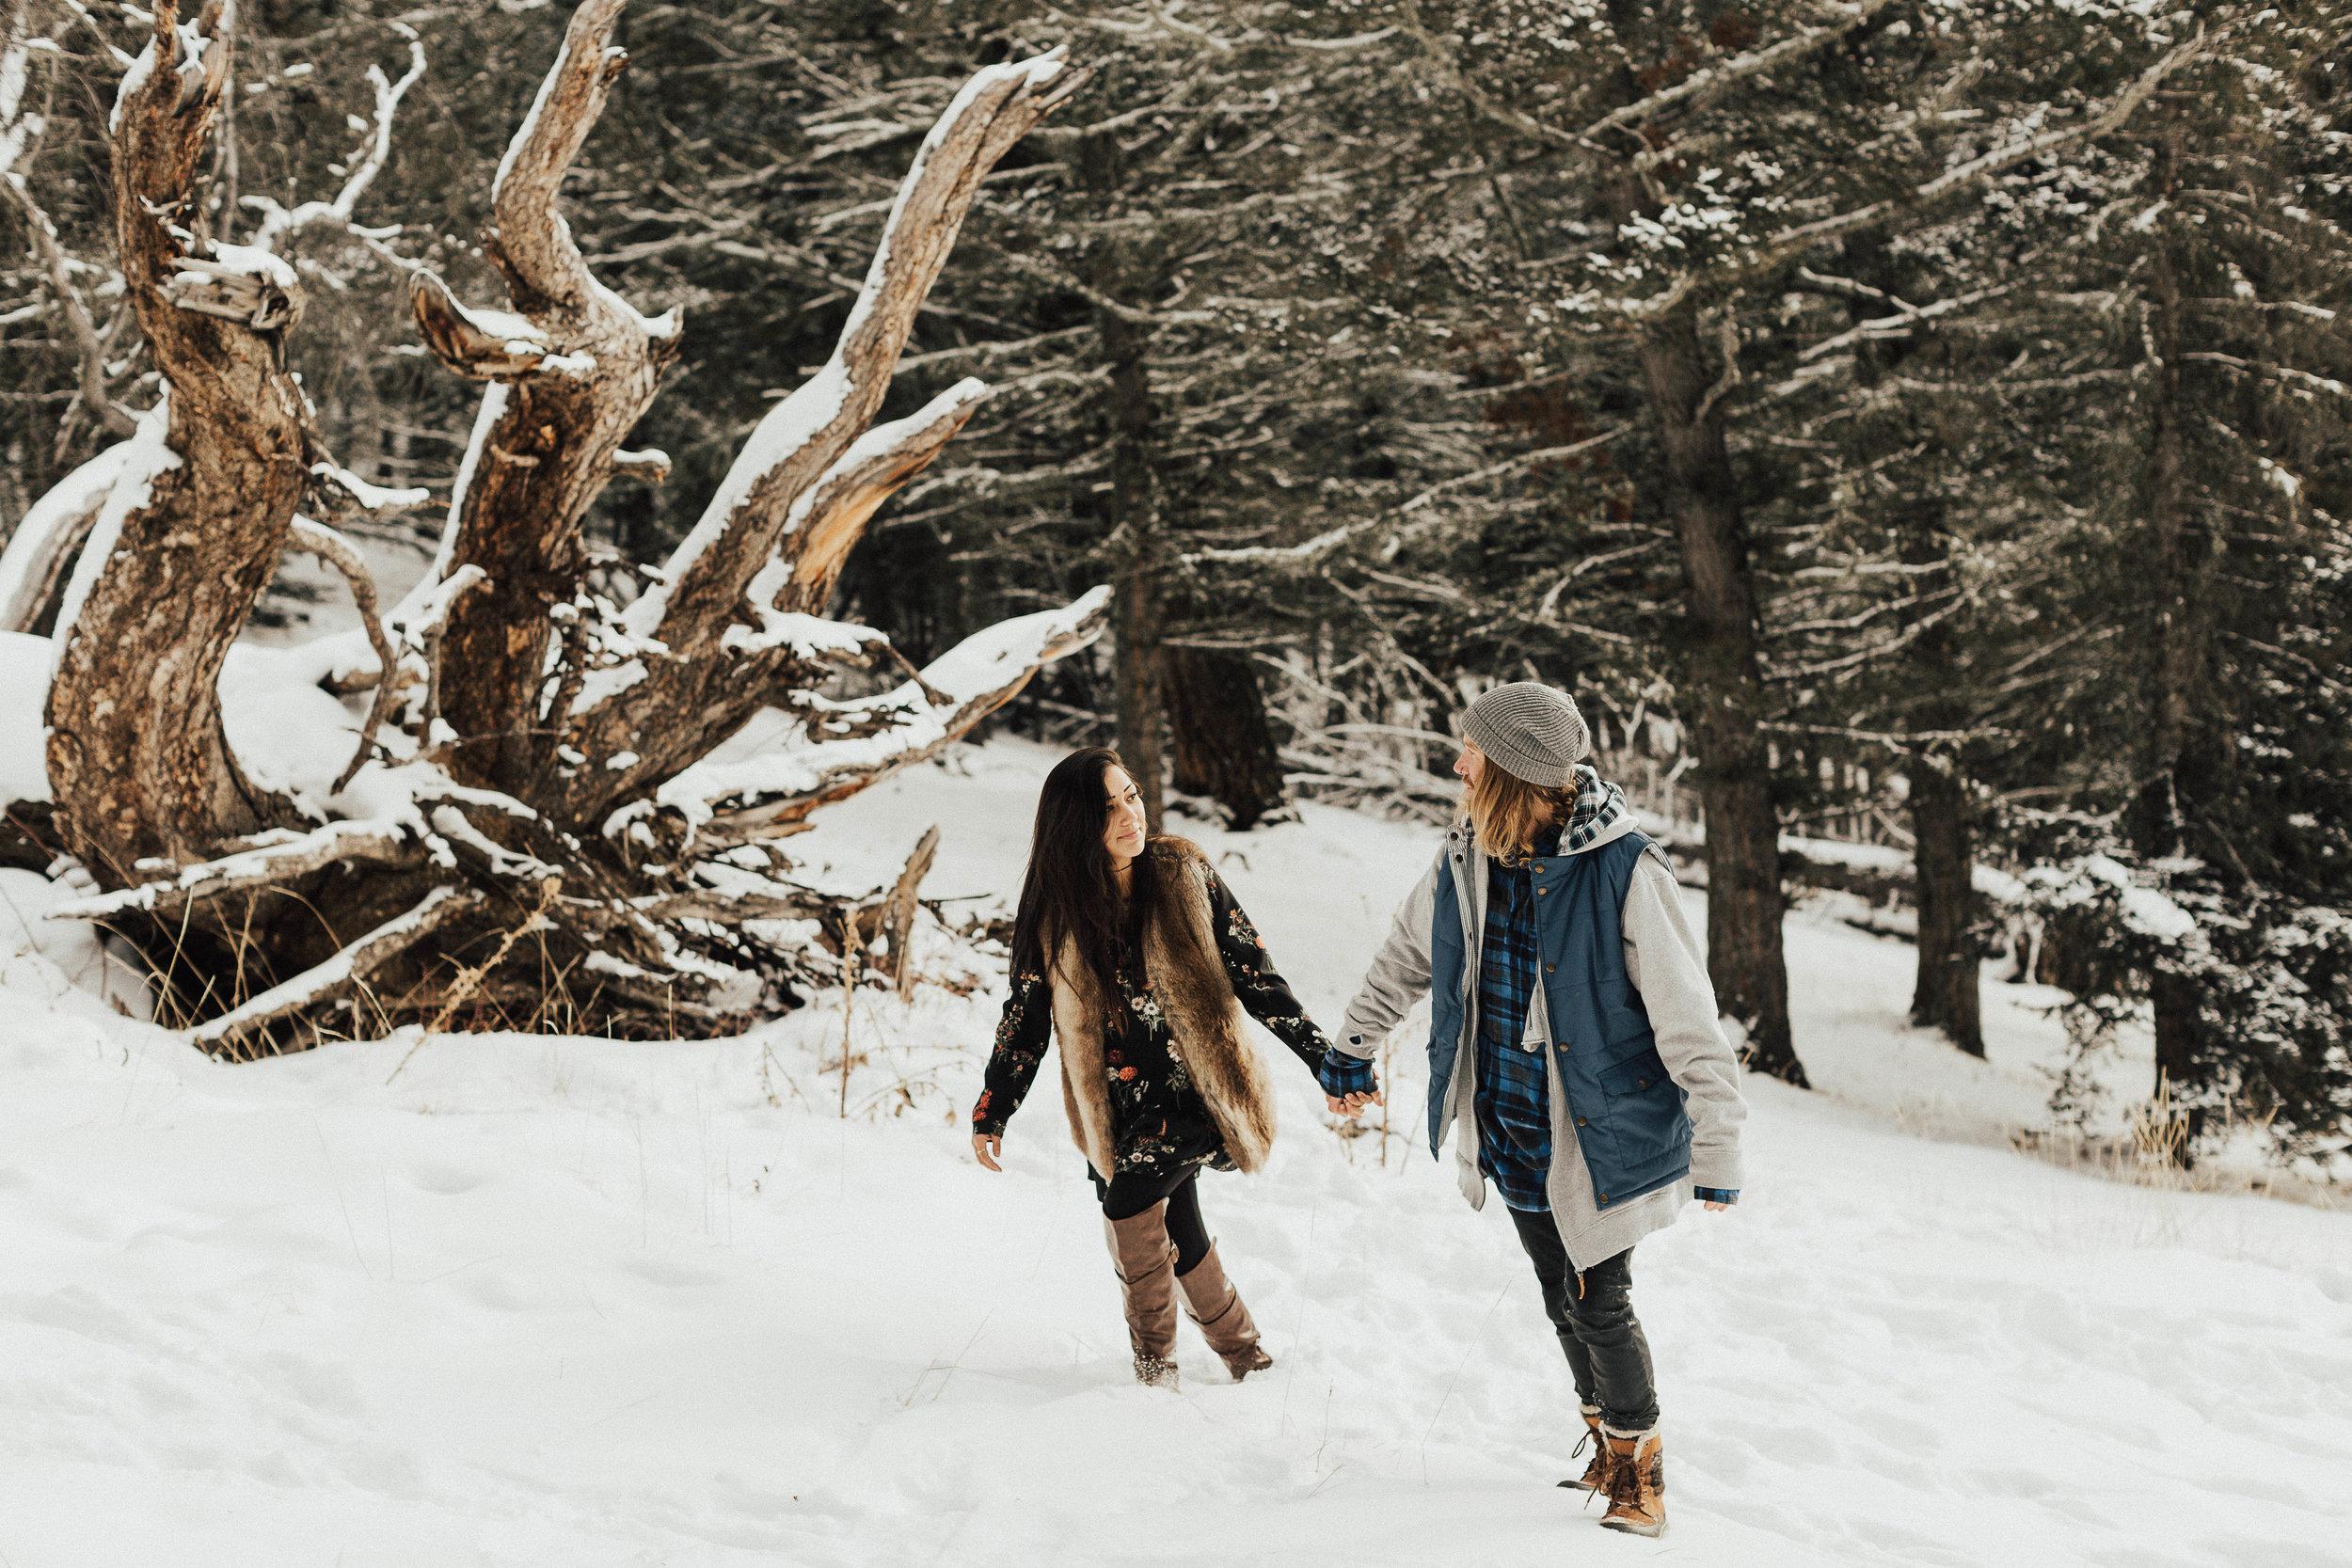 Banff Engagement Photographer - Winter Mountain Adventure Engagement Session - Michelle Larmand Photography-077